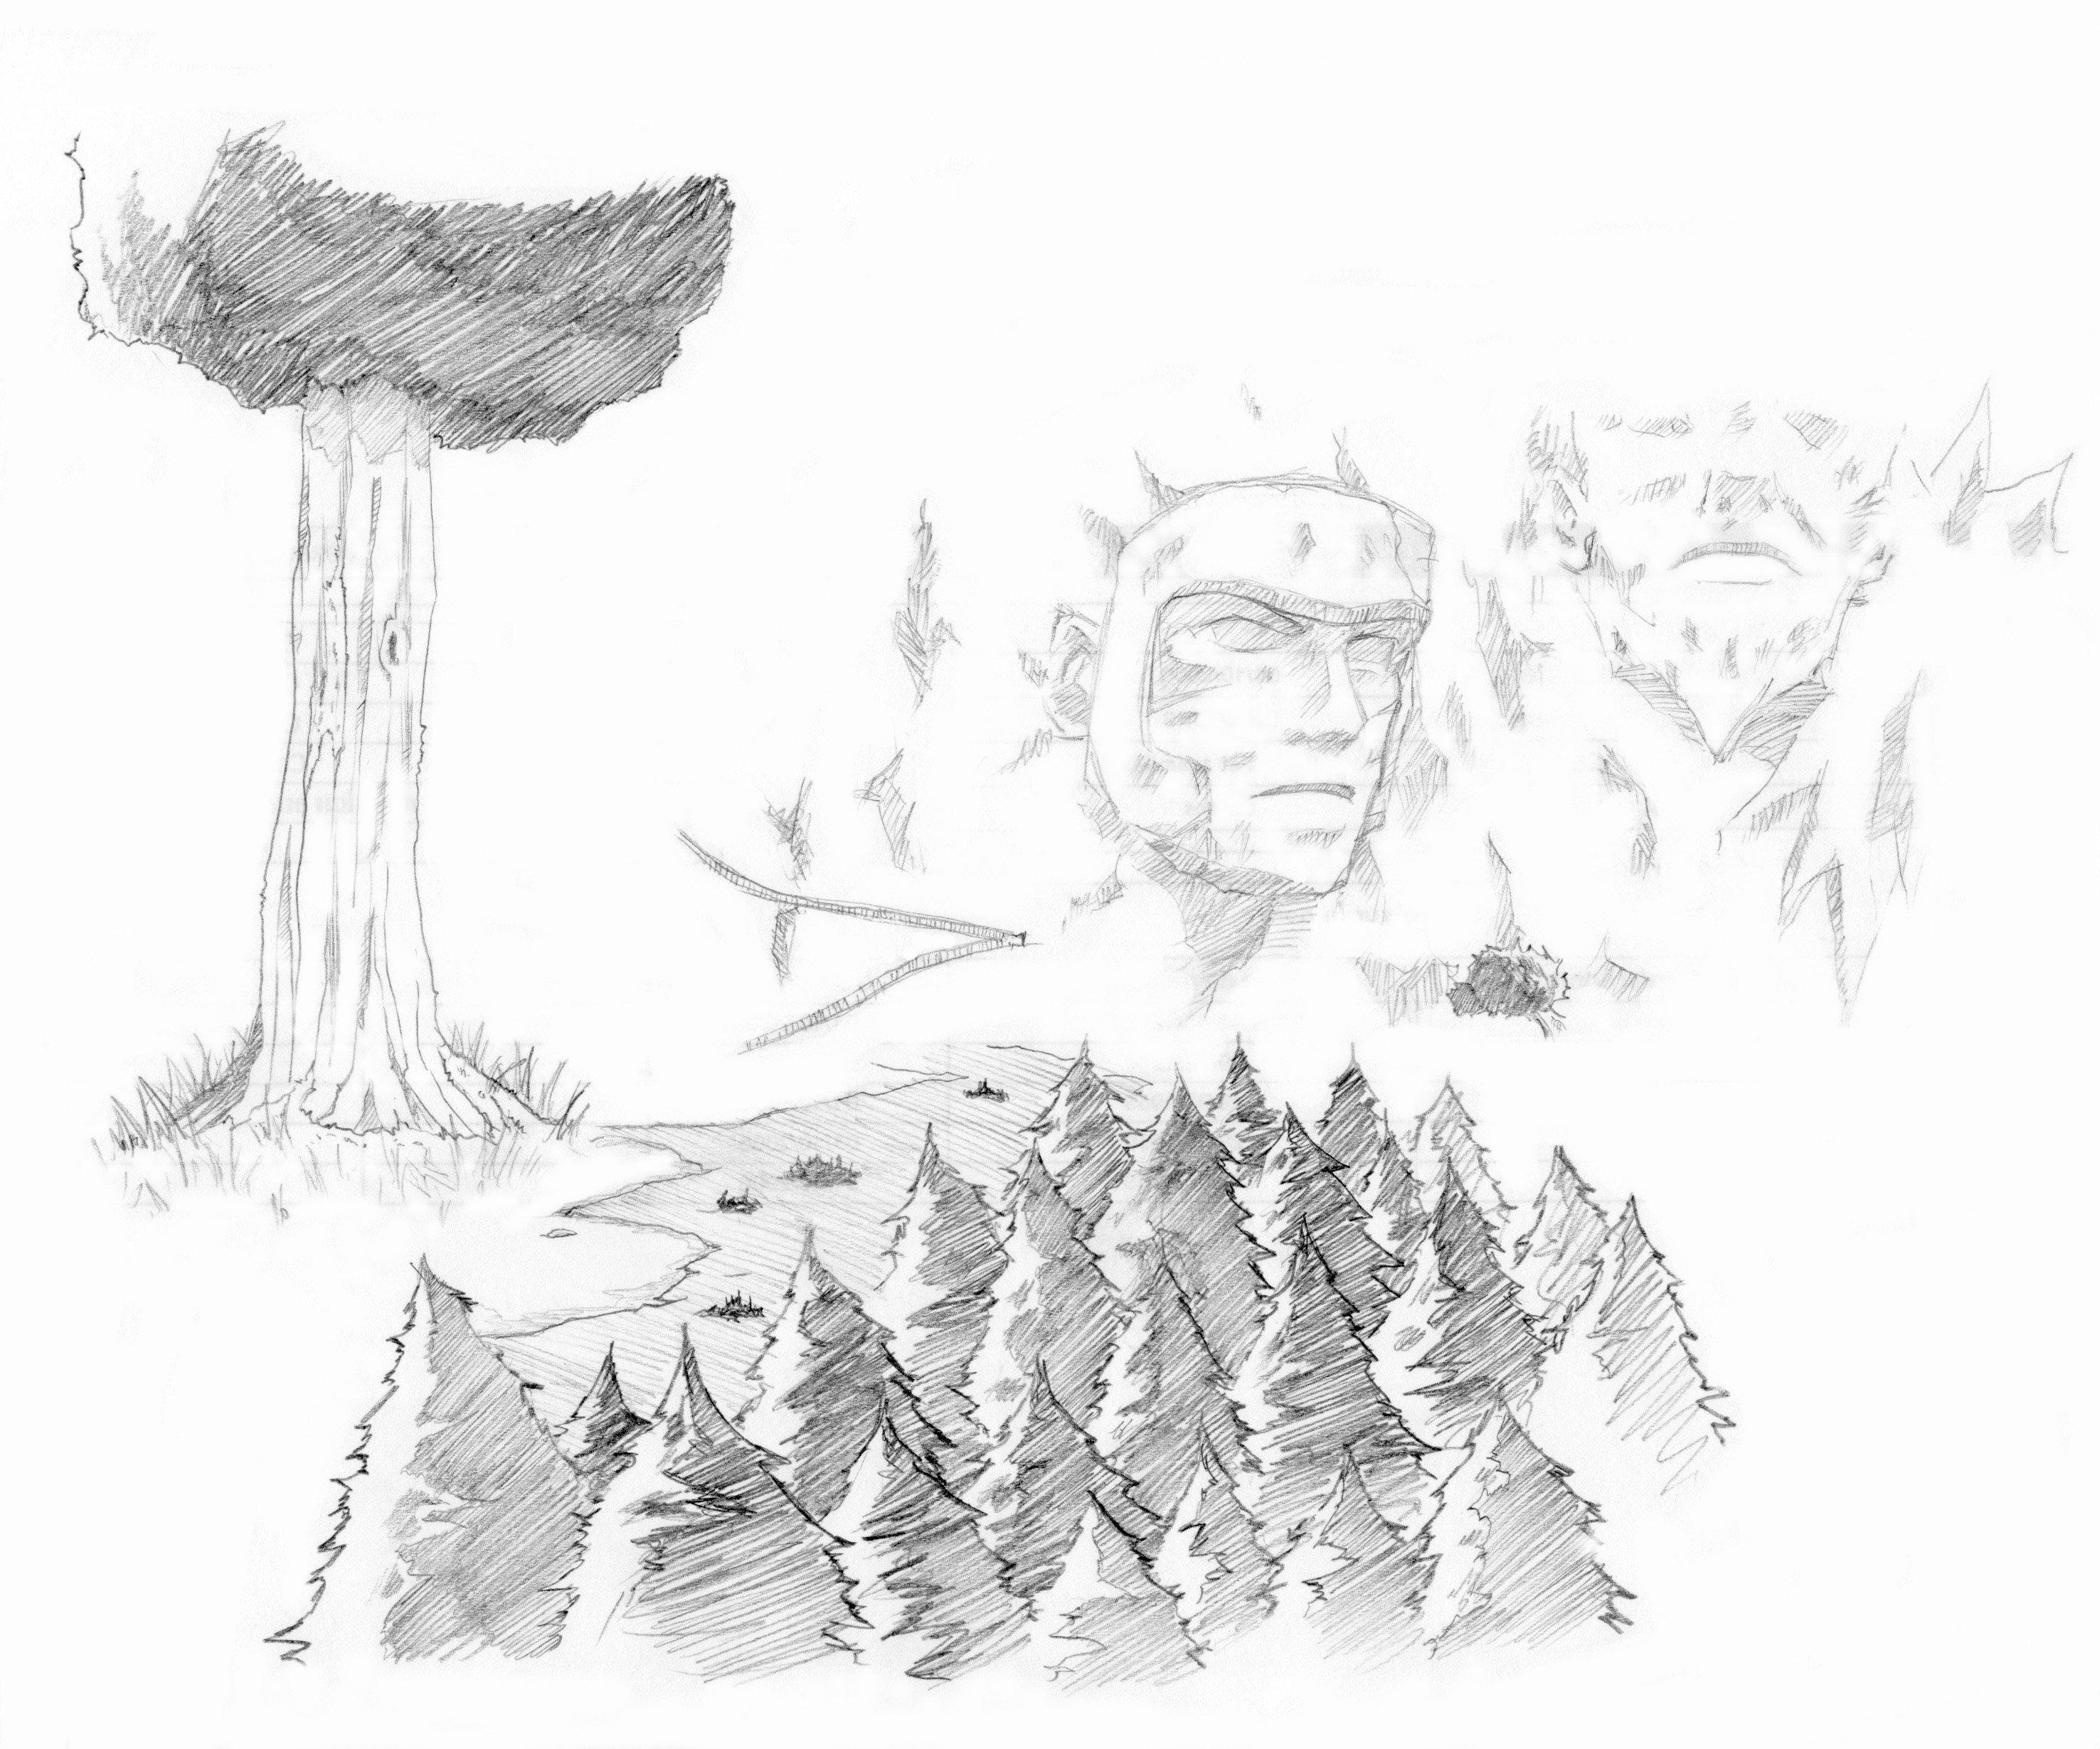 Le monde de naruto crayon at the edge of the worlds - Dessin naruto manga ...